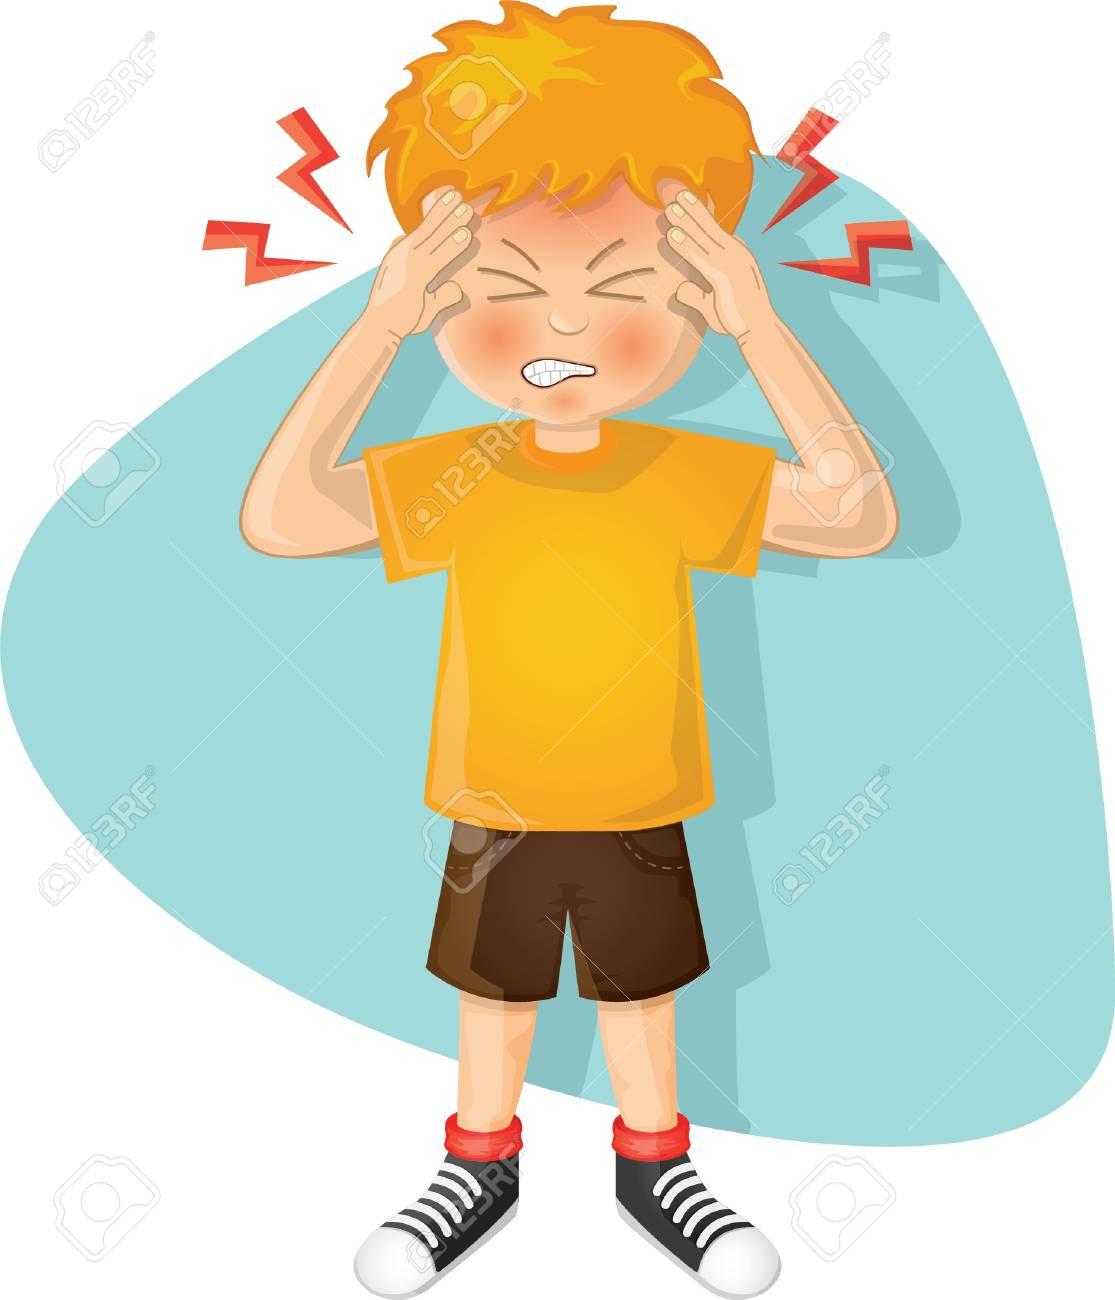 boy with a headache - 106675225